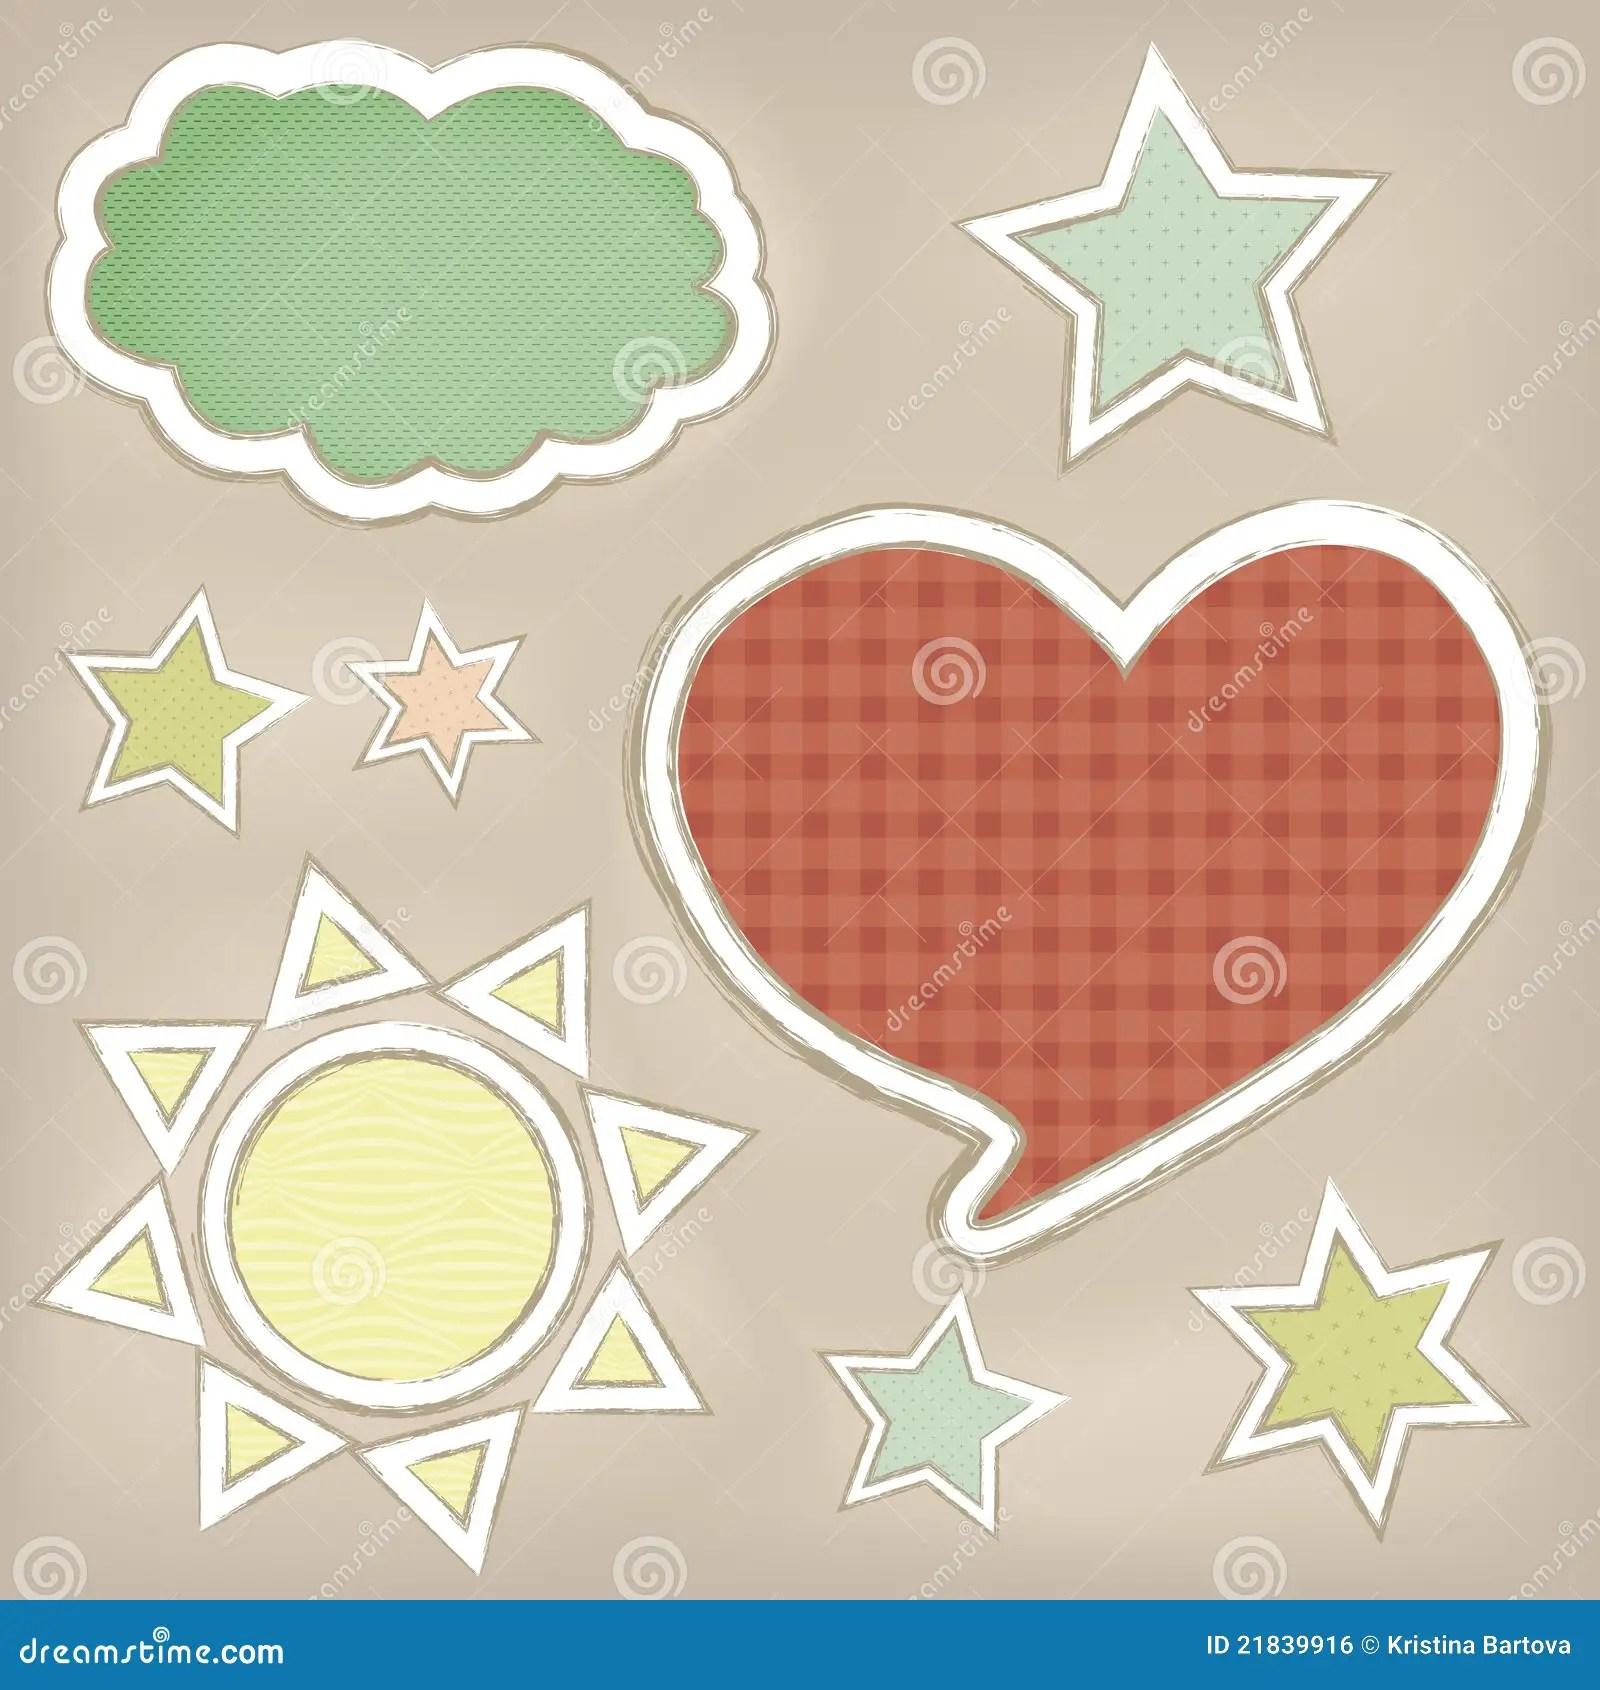 Cute Kid Love Wallpaper Cute Shapes Stock Vector Image Of Children Card Shape